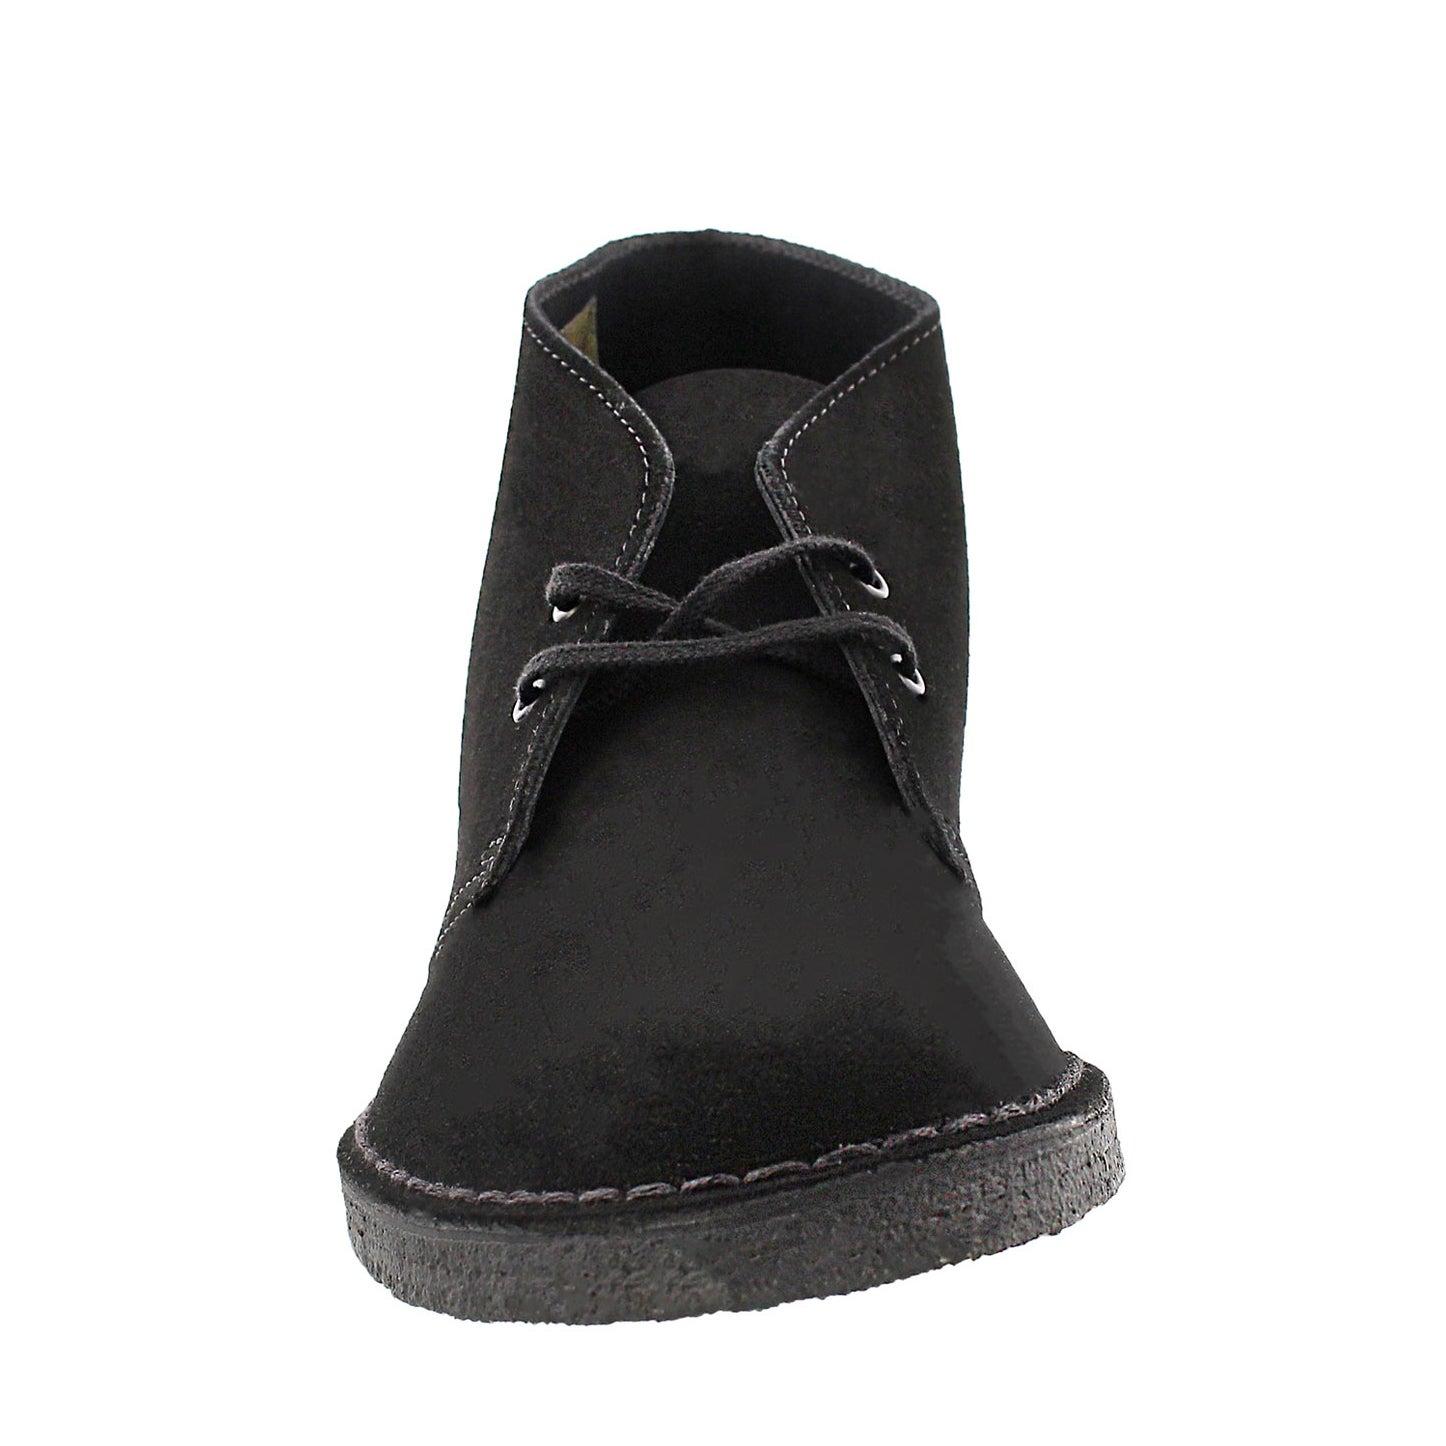 Mns Originals Desert Boot black suede